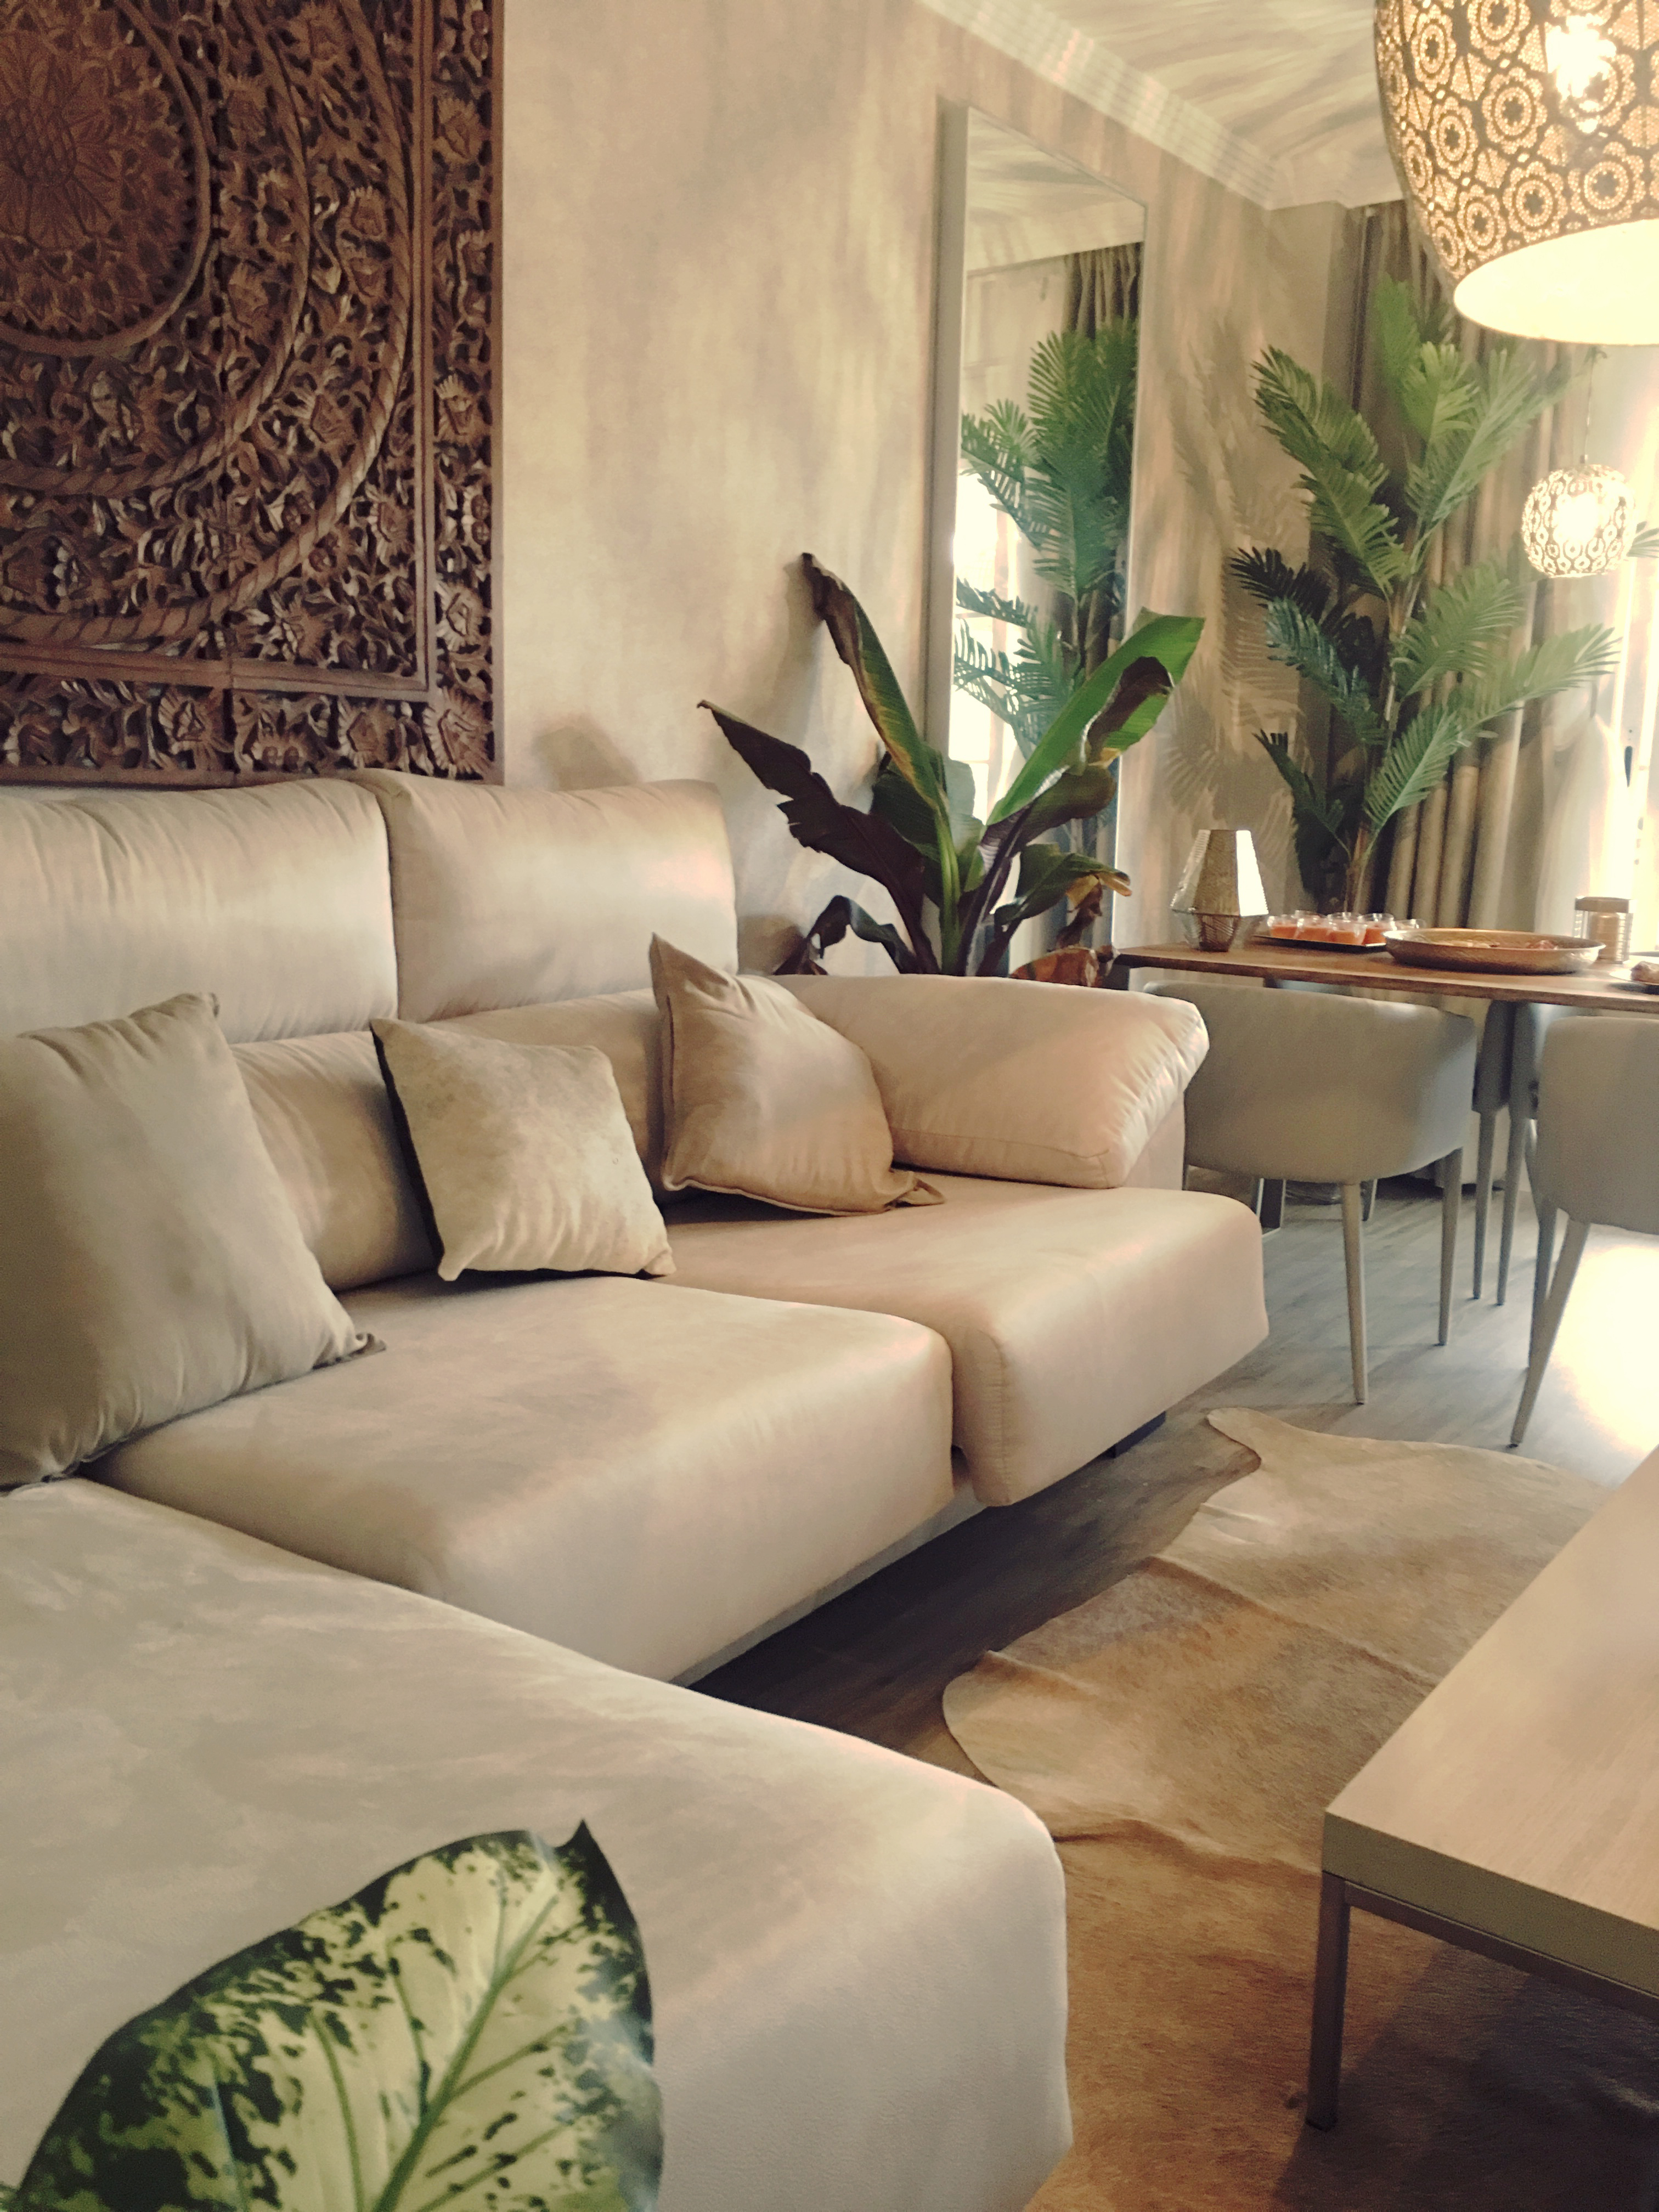 vista detalle de decoracion sofa